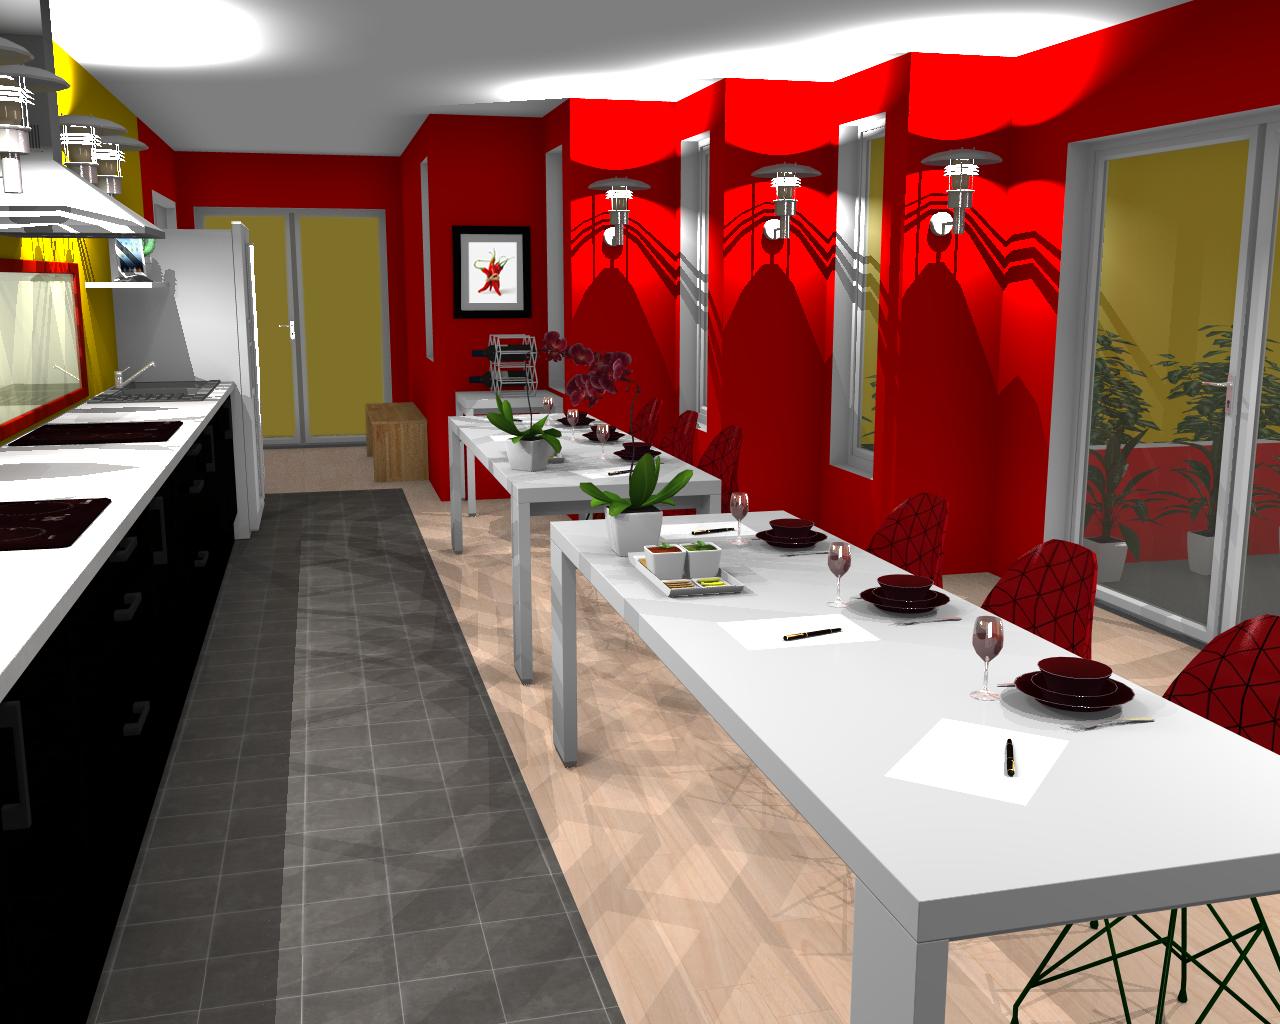 Home Design Rendering Software Part - 37: Kitchen Interior Design Ideas- Kitchen Rendering With Free Home Design  Software- Red Kitchen Http